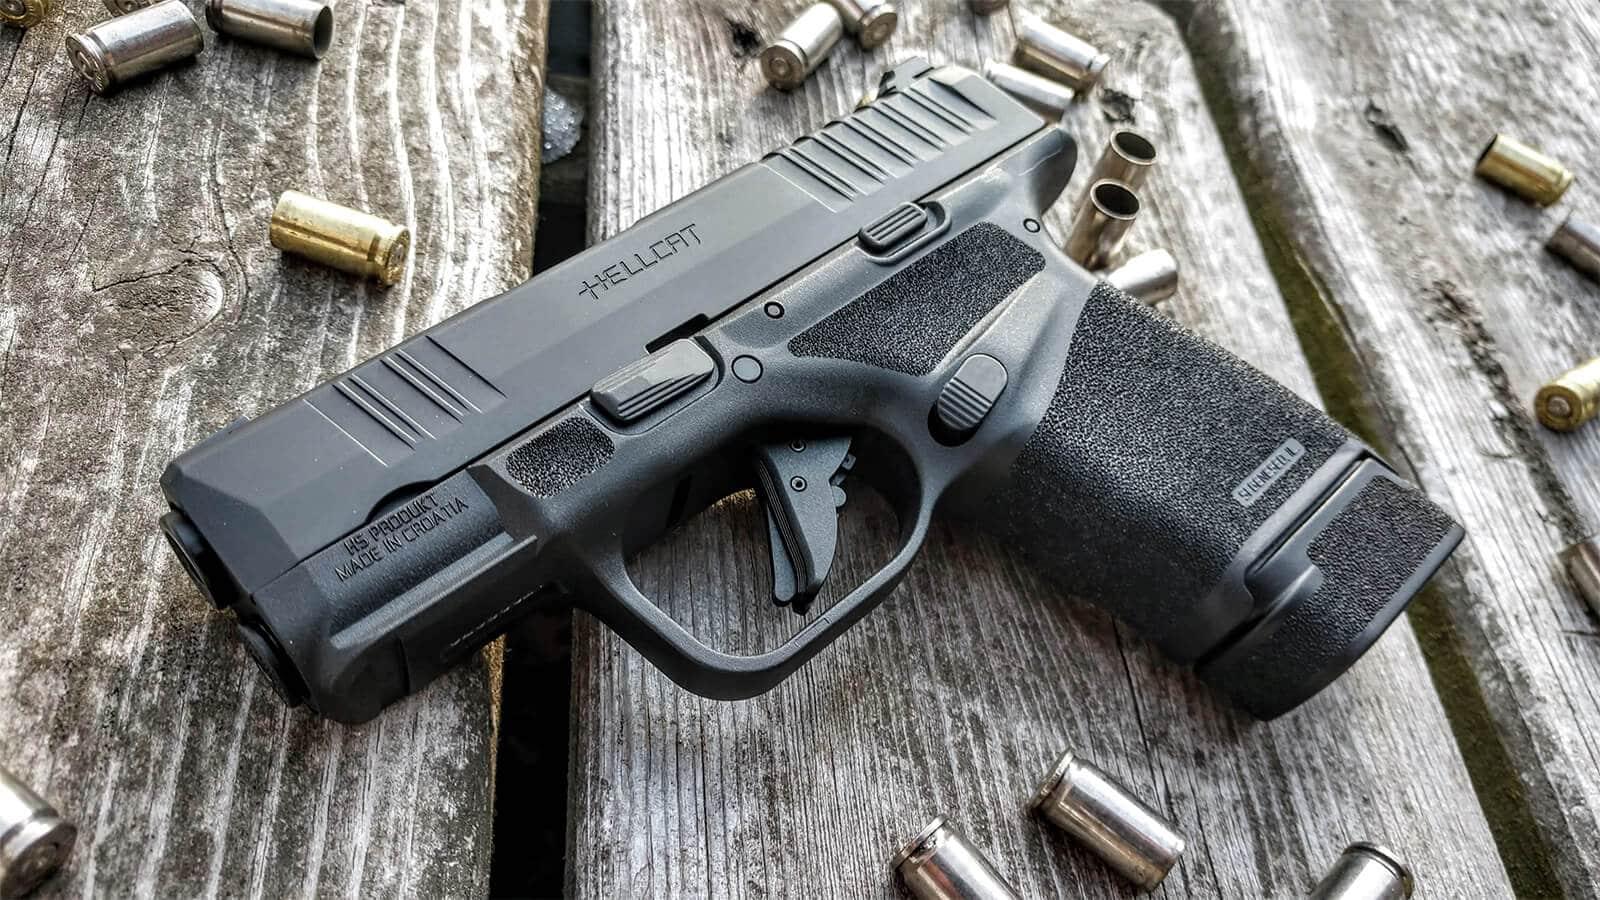 Springfield Armory Hellcat pistol